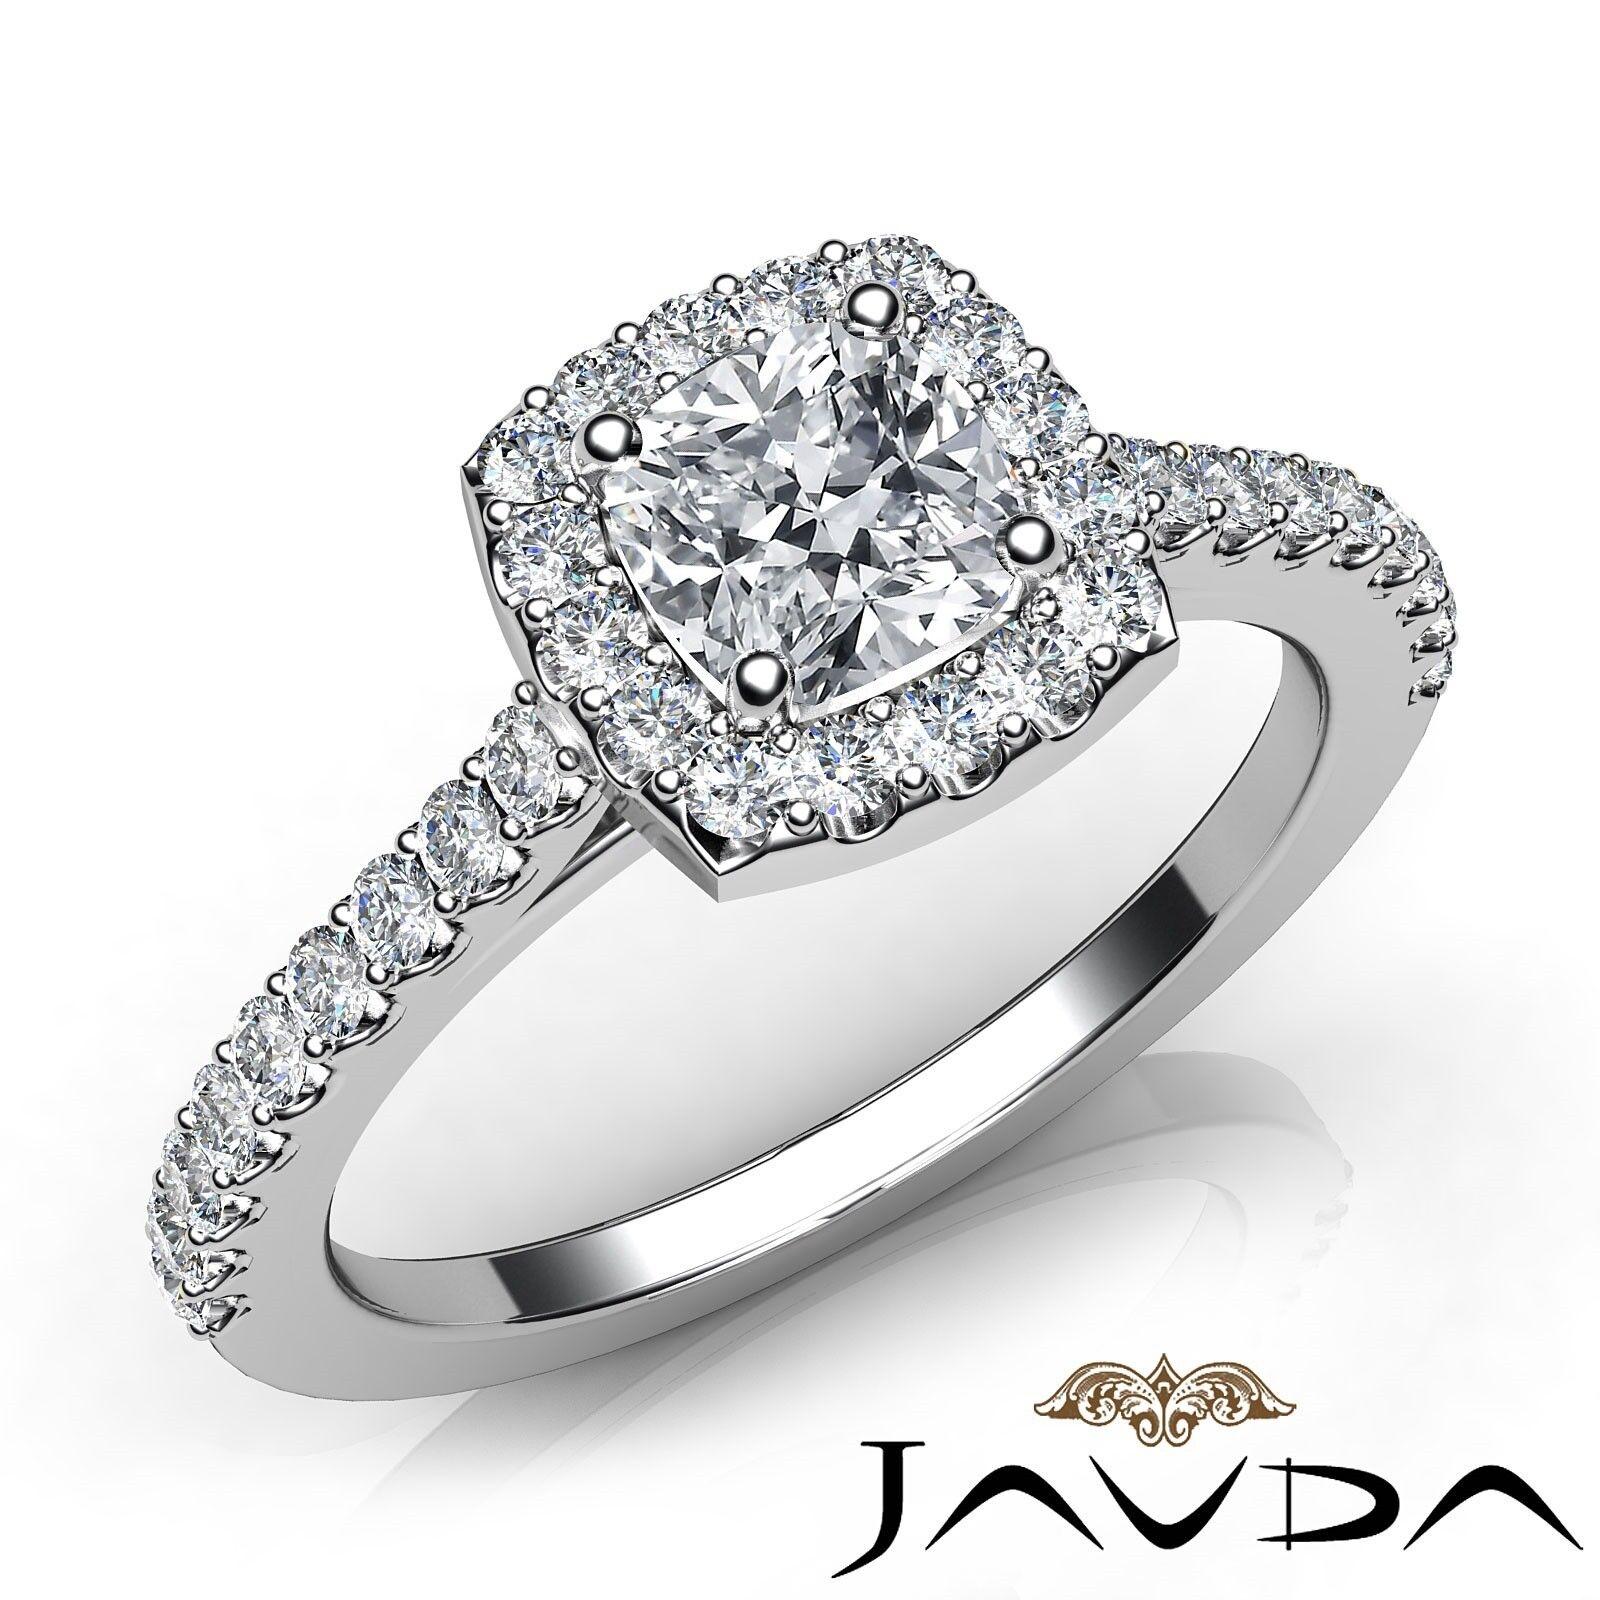 1.01ct U Cut Pave Set Halo Cushion Diamond Engagement Ring GIA J-VVS2 White Gold